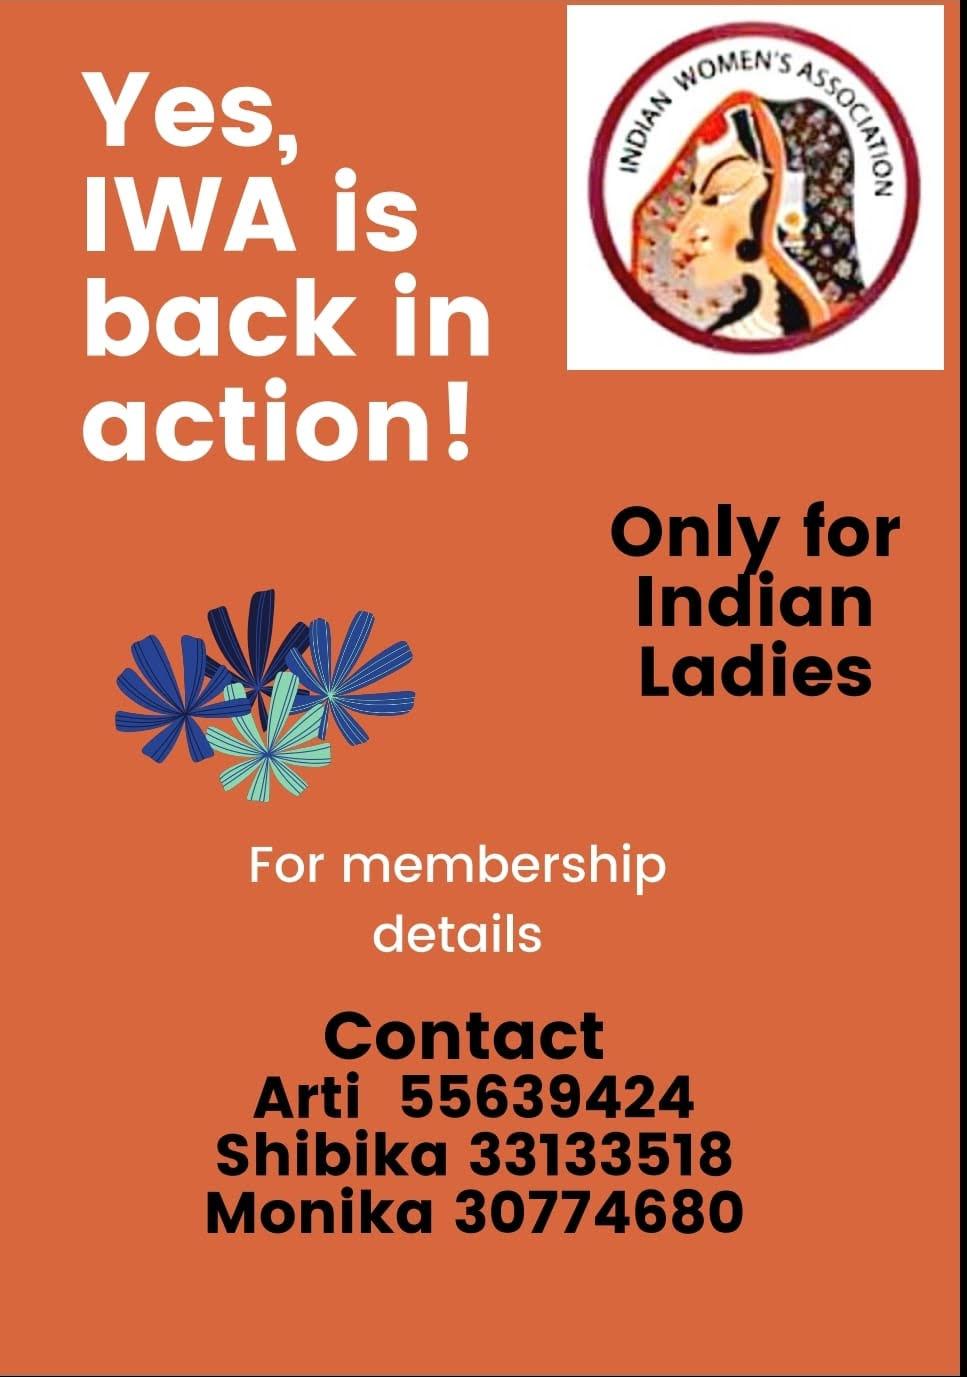 JOIN IWA ! INVITING INDIAN LADIES FOR MEMBERSHIPS Contact Arti @ 55639424, Shibika @ 33133518, Monika @ 30774680